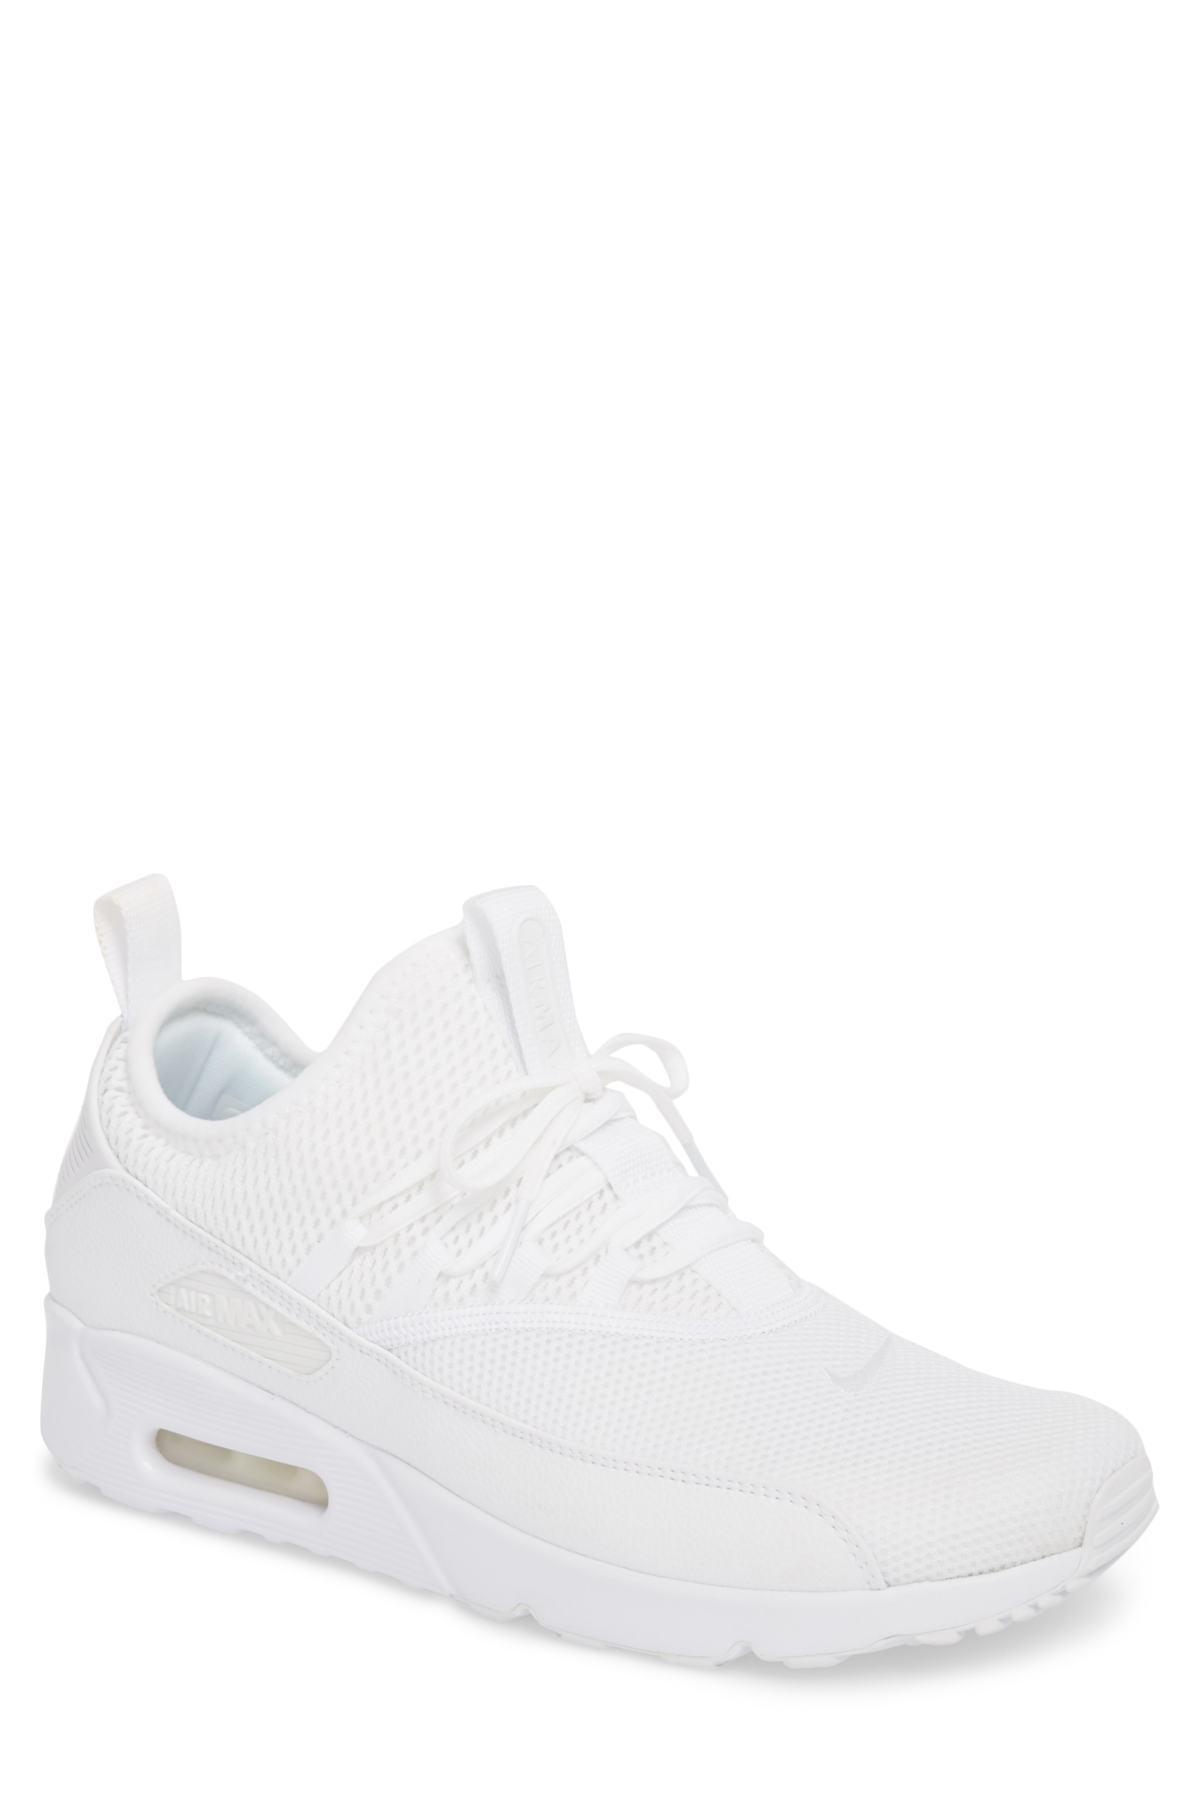 new style 47380 a33fc Nike White Air Max 90 Ez Sneaker (men) for men